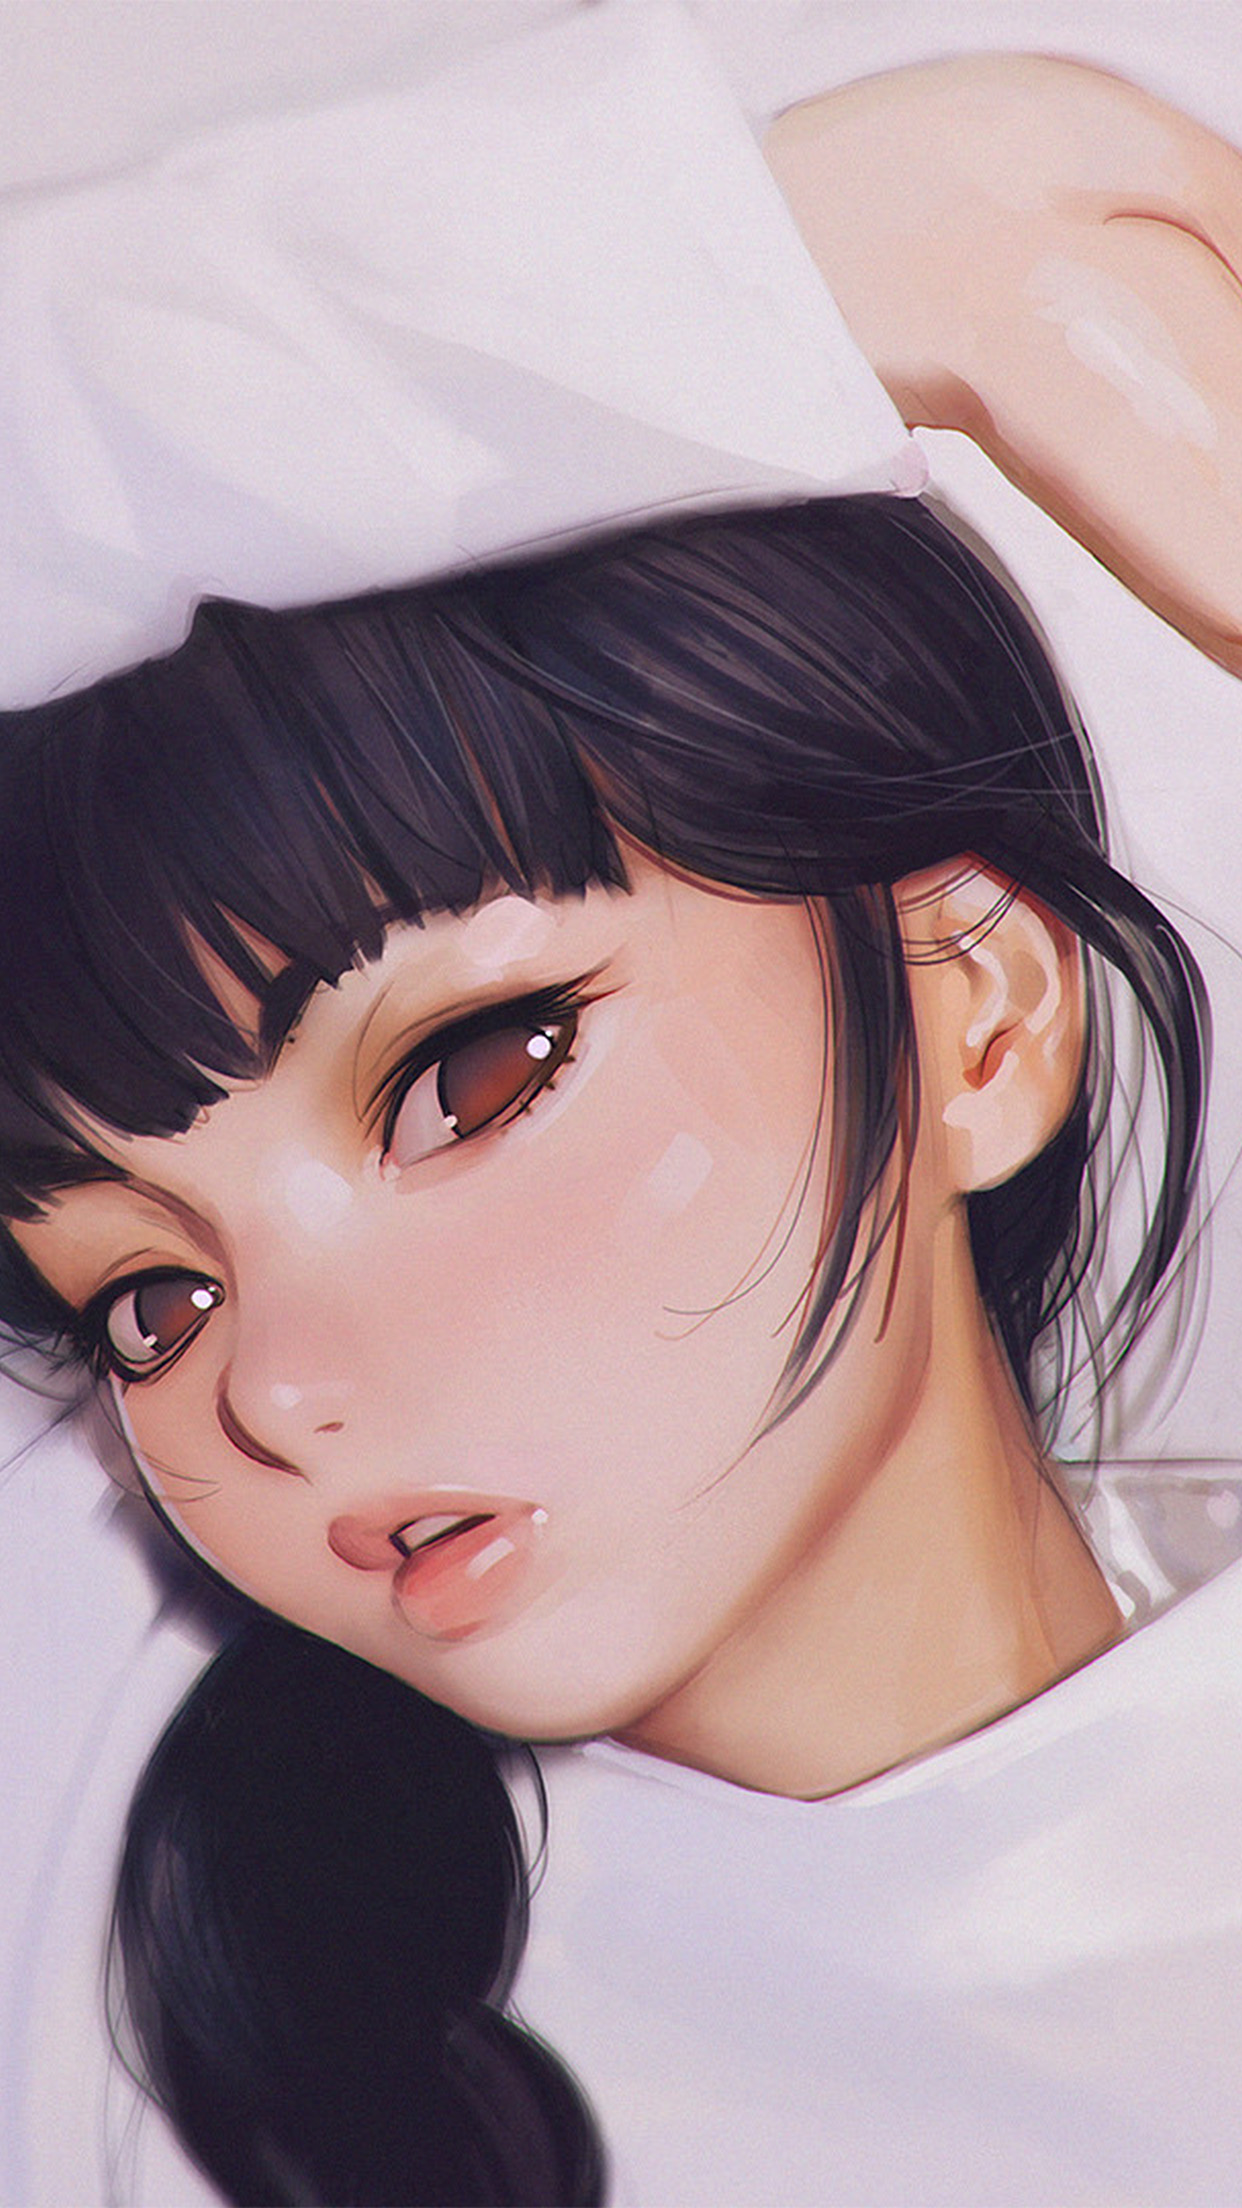 Anime Wallpaper Steam Papers Co Iphone Wallpaper Aw24 Ilya Kuvshinov Anime